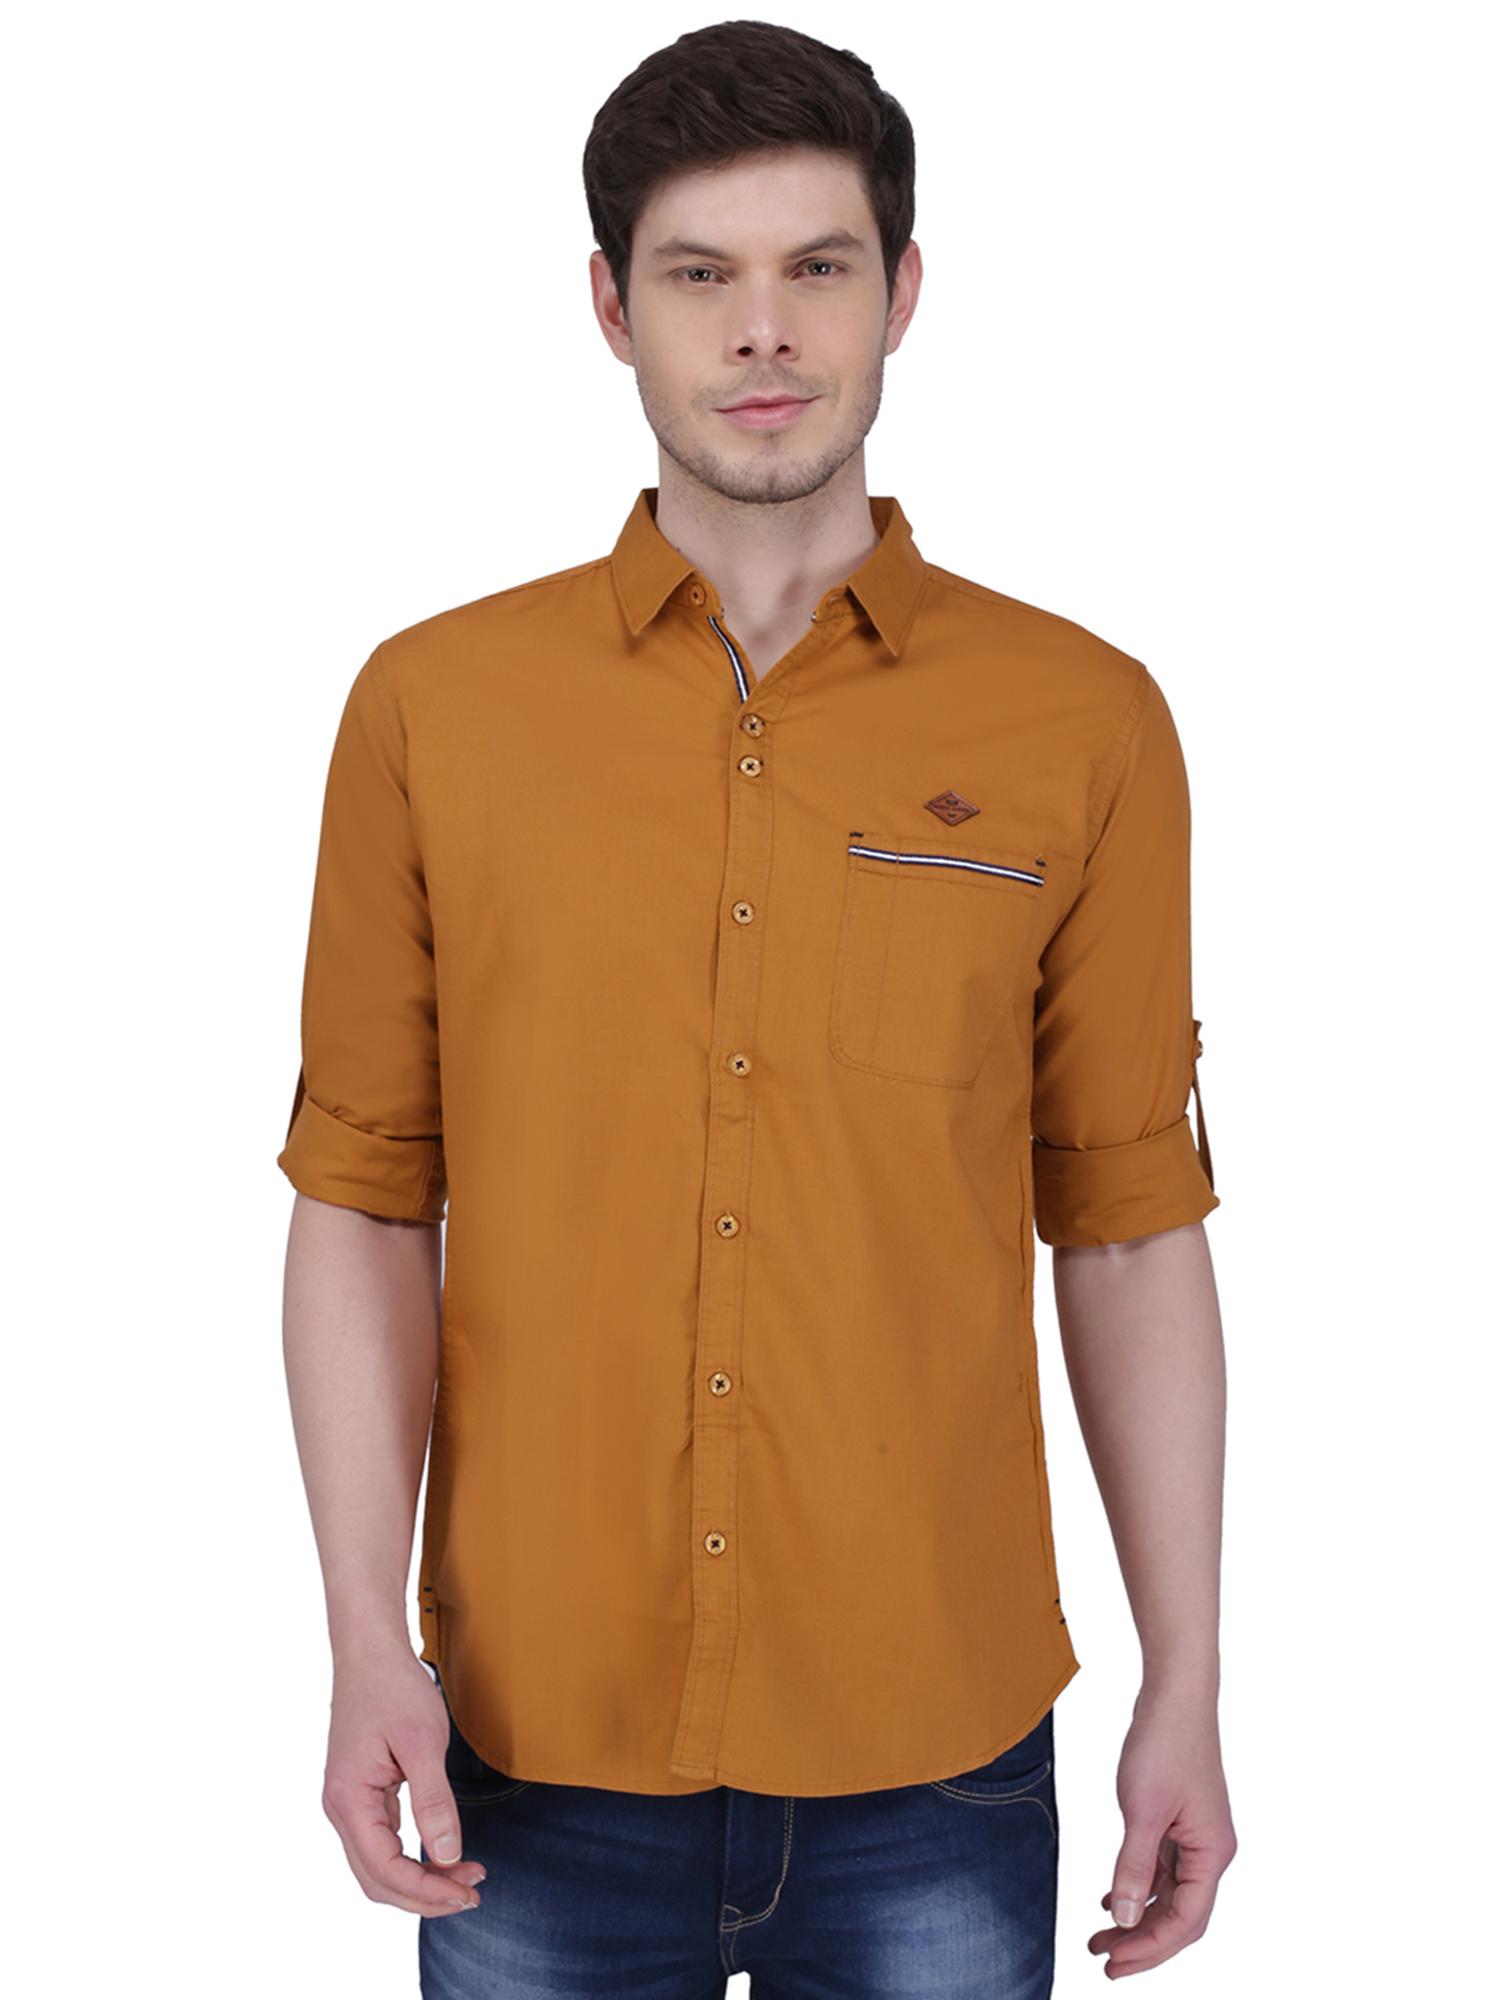 Kuons Avenue | Kuons Avenue Men's Mustard Linen Cotton Shirt- KACLFS1305YL